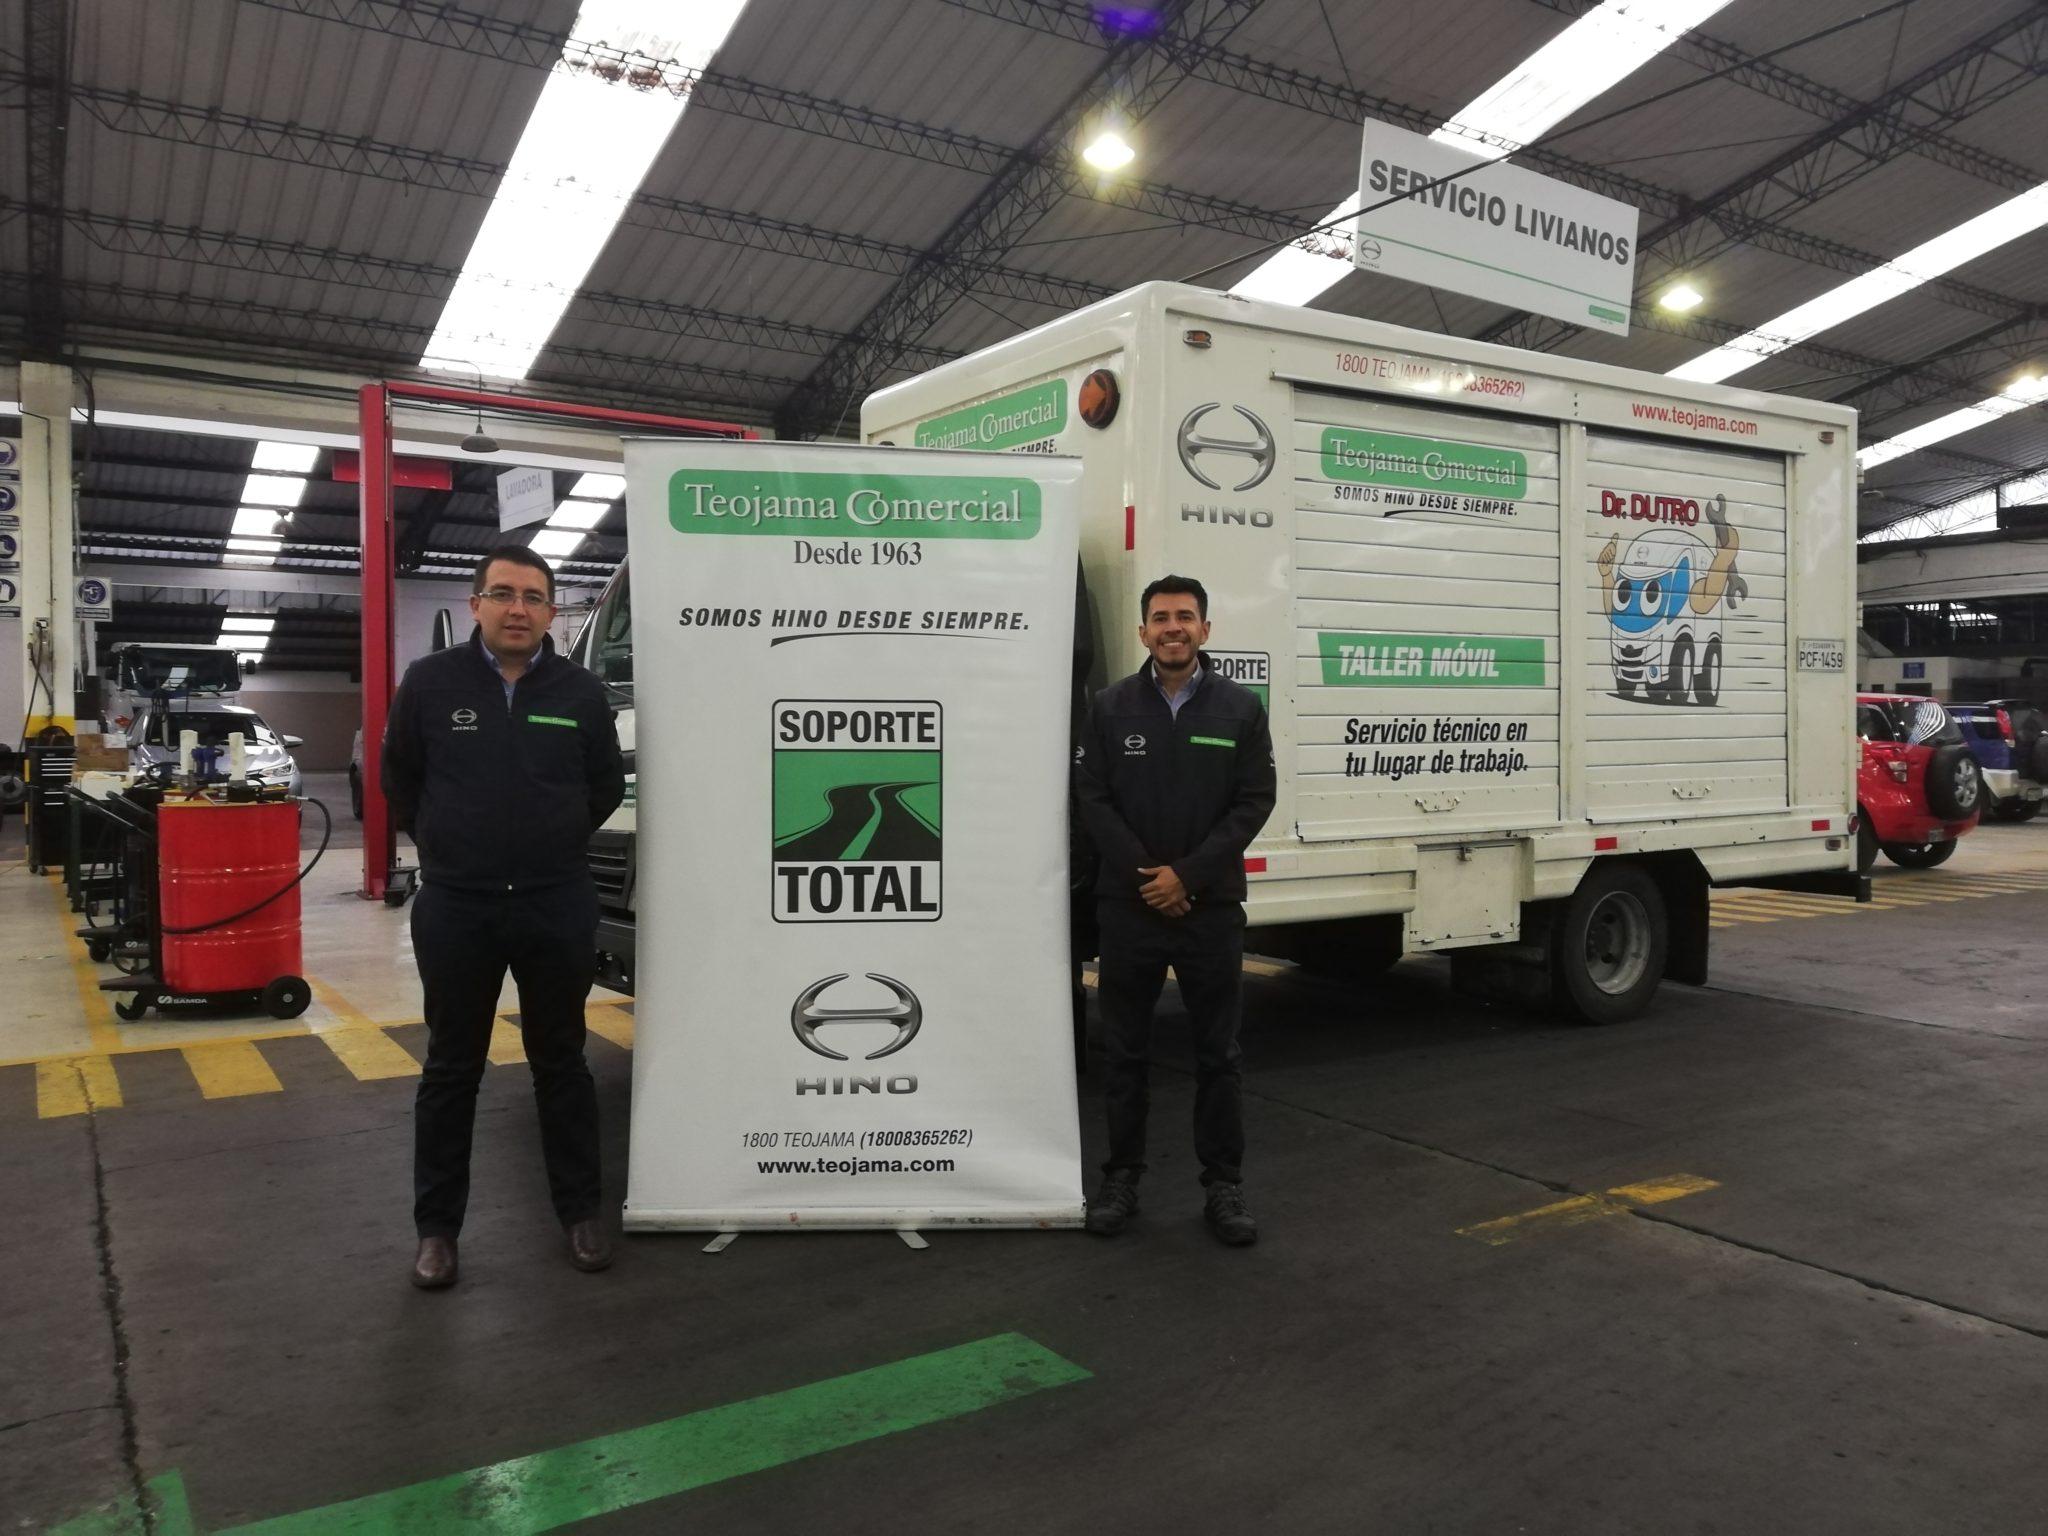 Teojama comercial servicio de talleres móviles